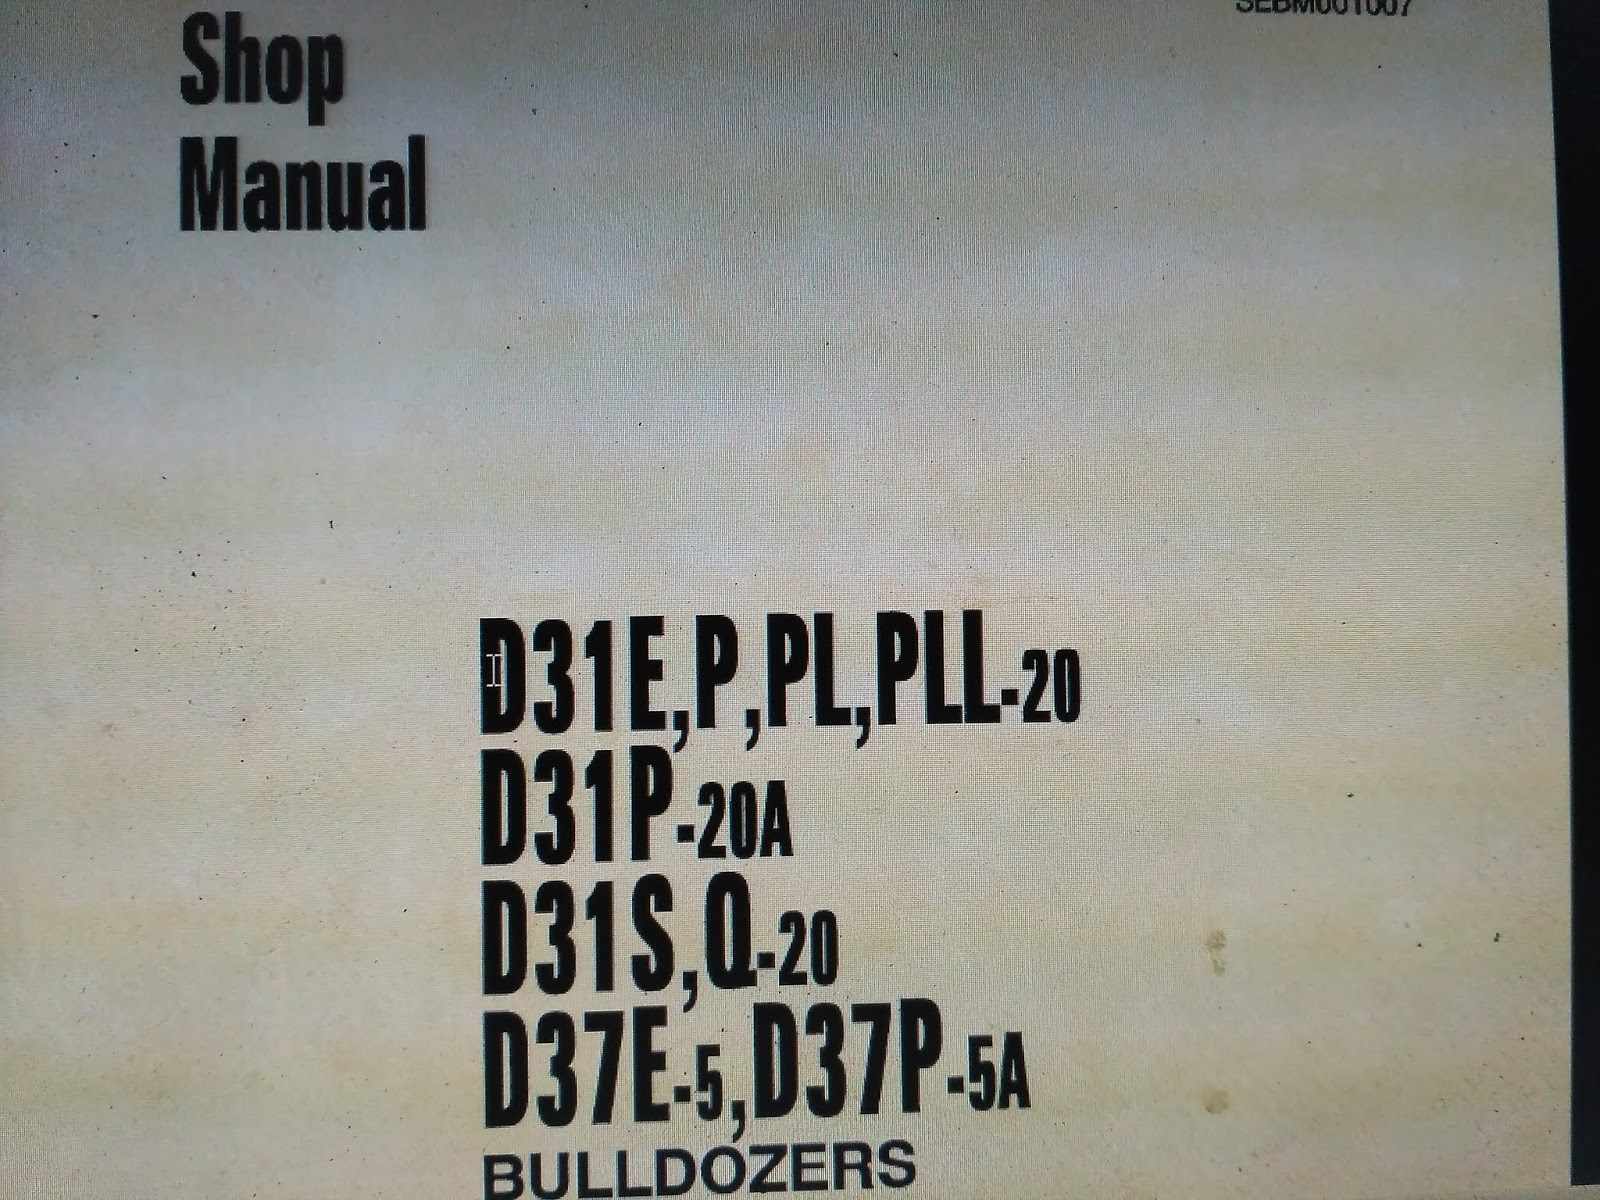 hight resolution of d31p 20a d31p 20 d37e 5 d37p 5 tersedia shop manual bulldozer komatsu d31p 20a d31p 20 d37e 5 d37p 5 serta menyediakan shop manual parts manual excavator